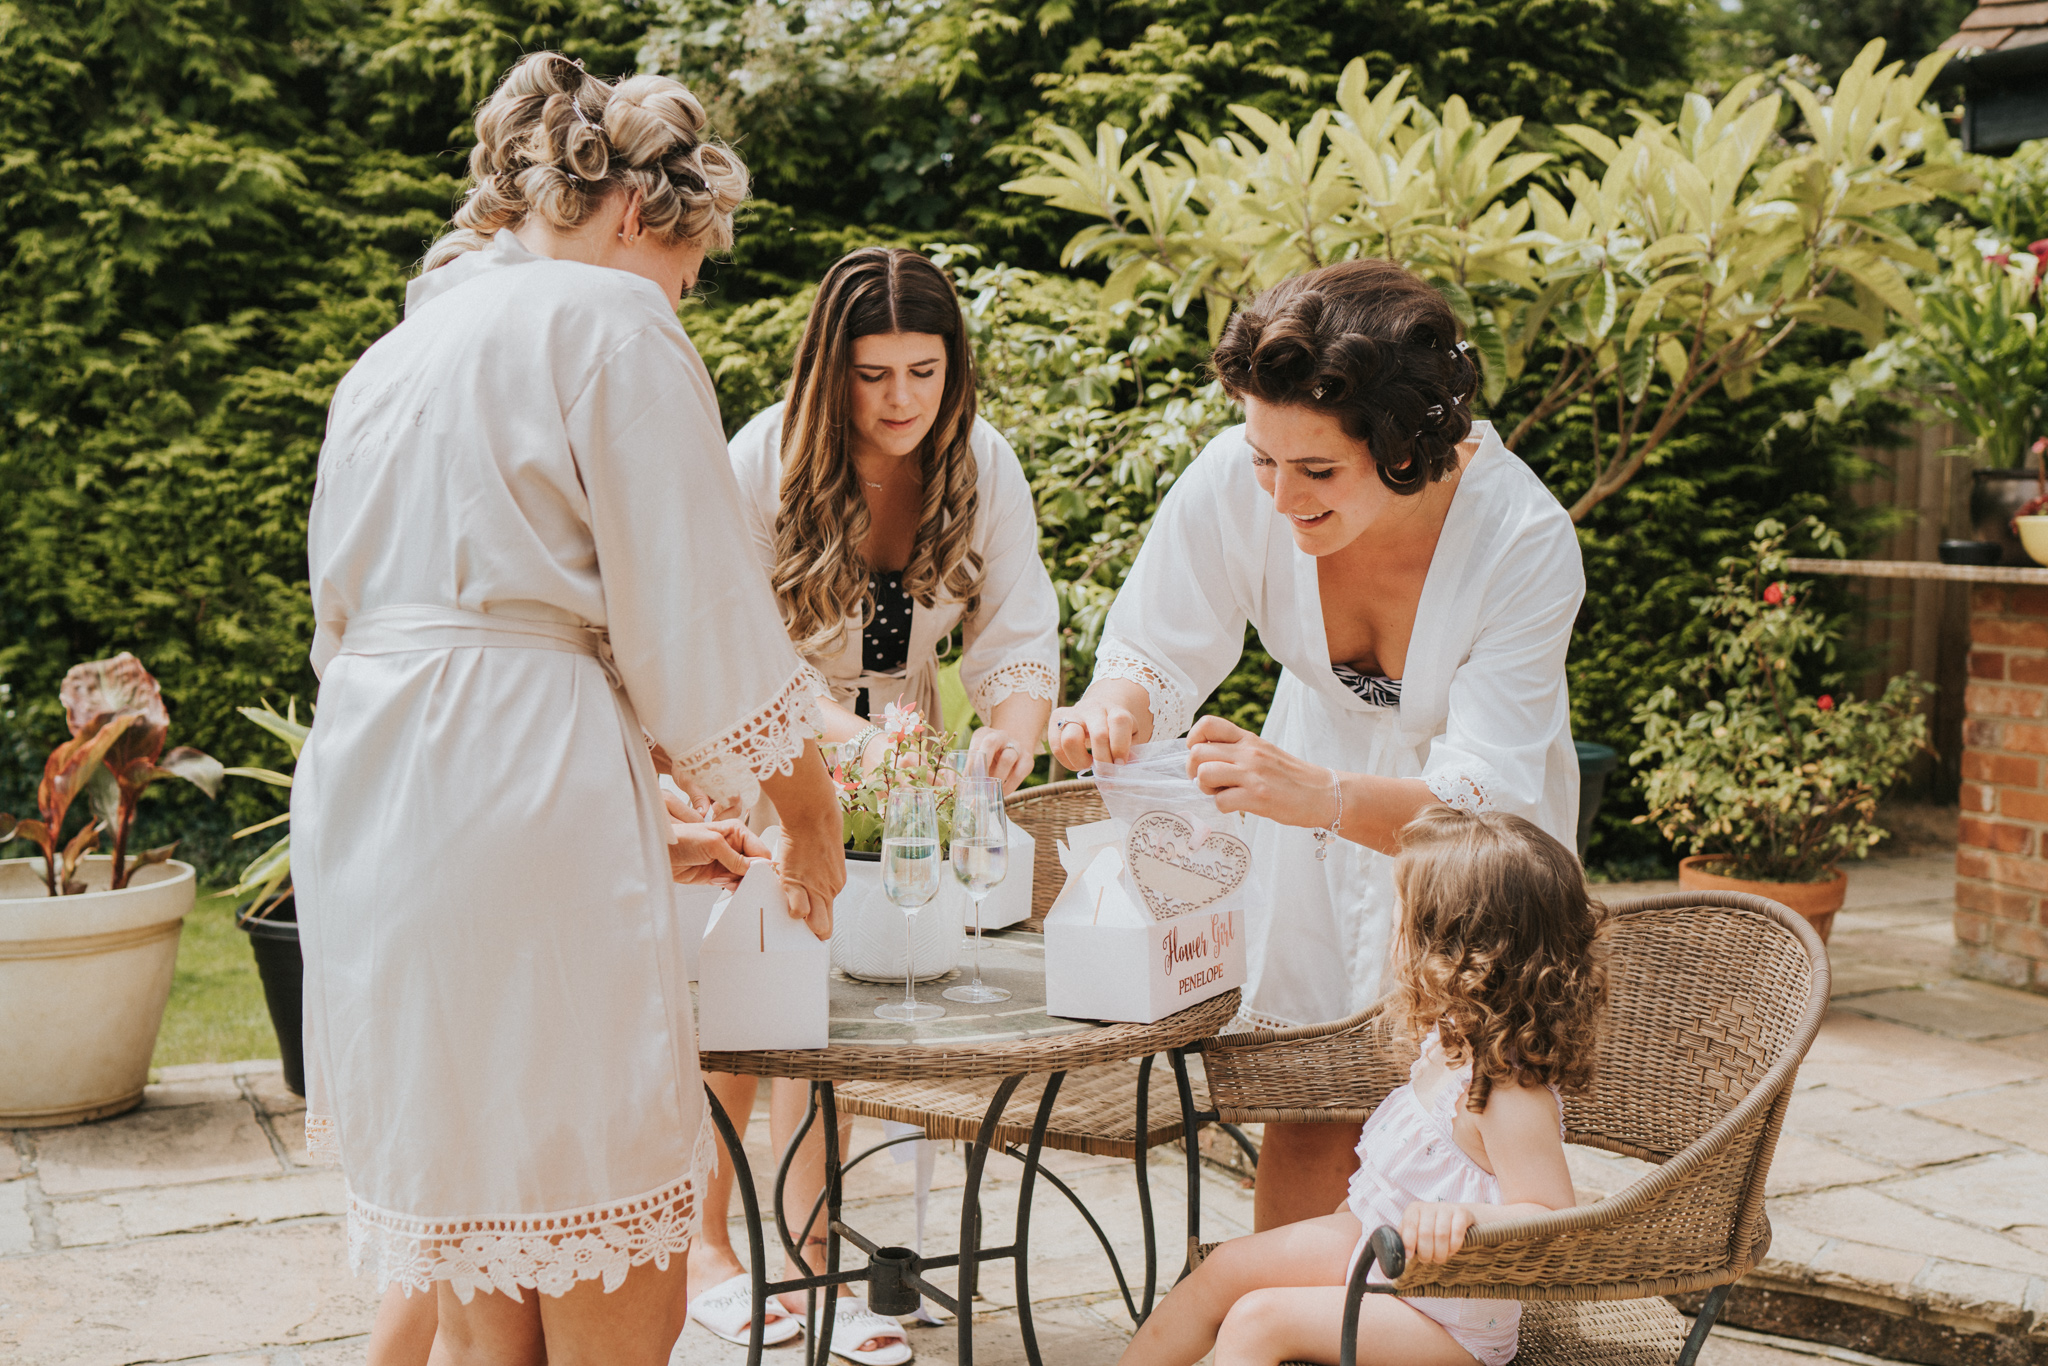 danielle-and-gareths-boho-wedding-previews-at-high-house-weddings-grace-elizabeth-colchester-essex-suffolk-norfolk-devon-alternative-wedding-and-lifestyle-photographer (5 of 76).jpg